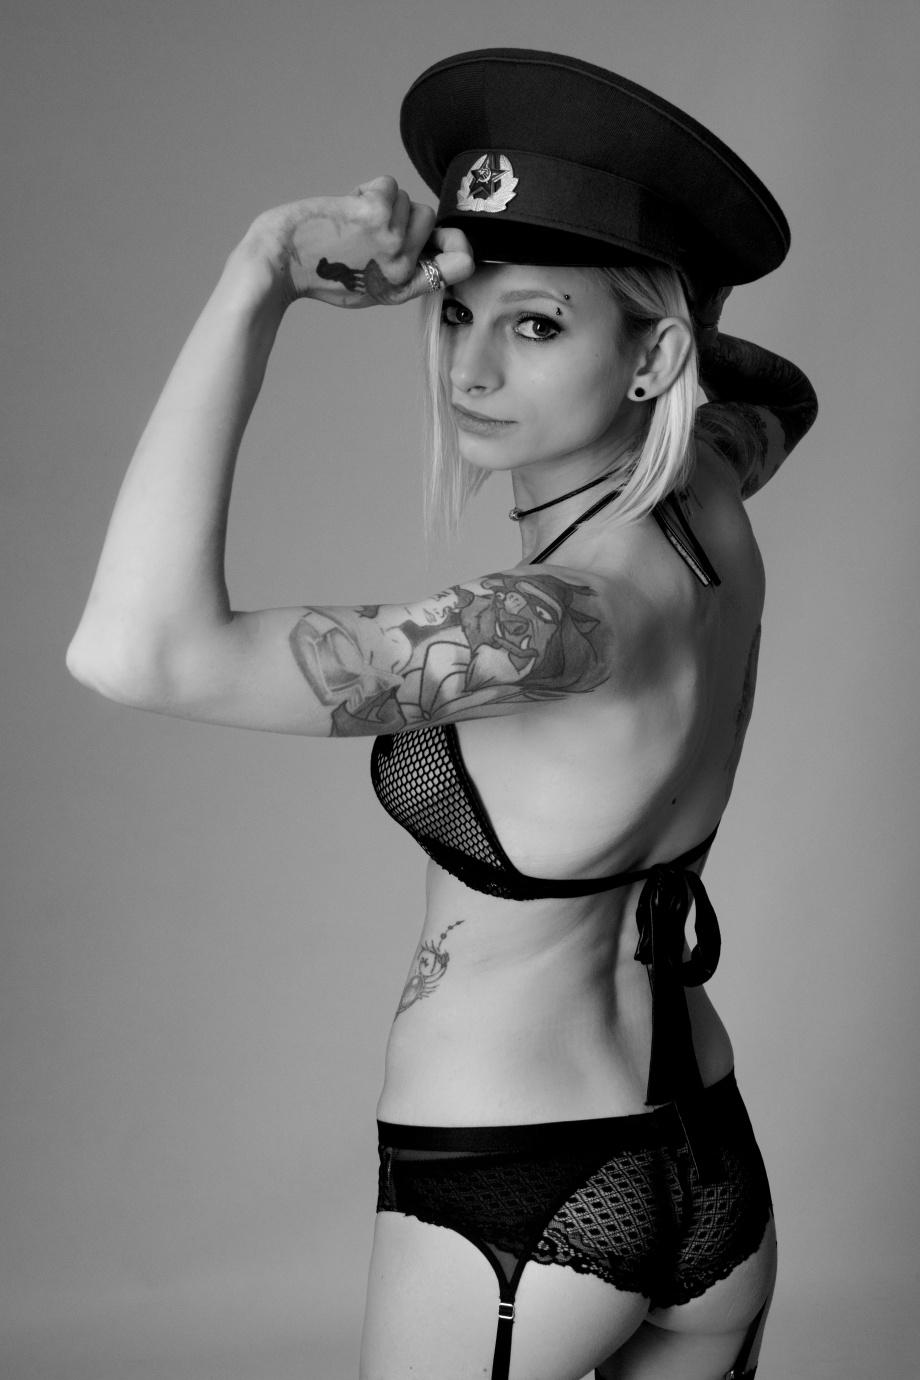 Liene Rauzenberga, Cork, Glamour, Boudoir, Model, Studio Shoot, black and white, topless, nude, alternative, tattoos